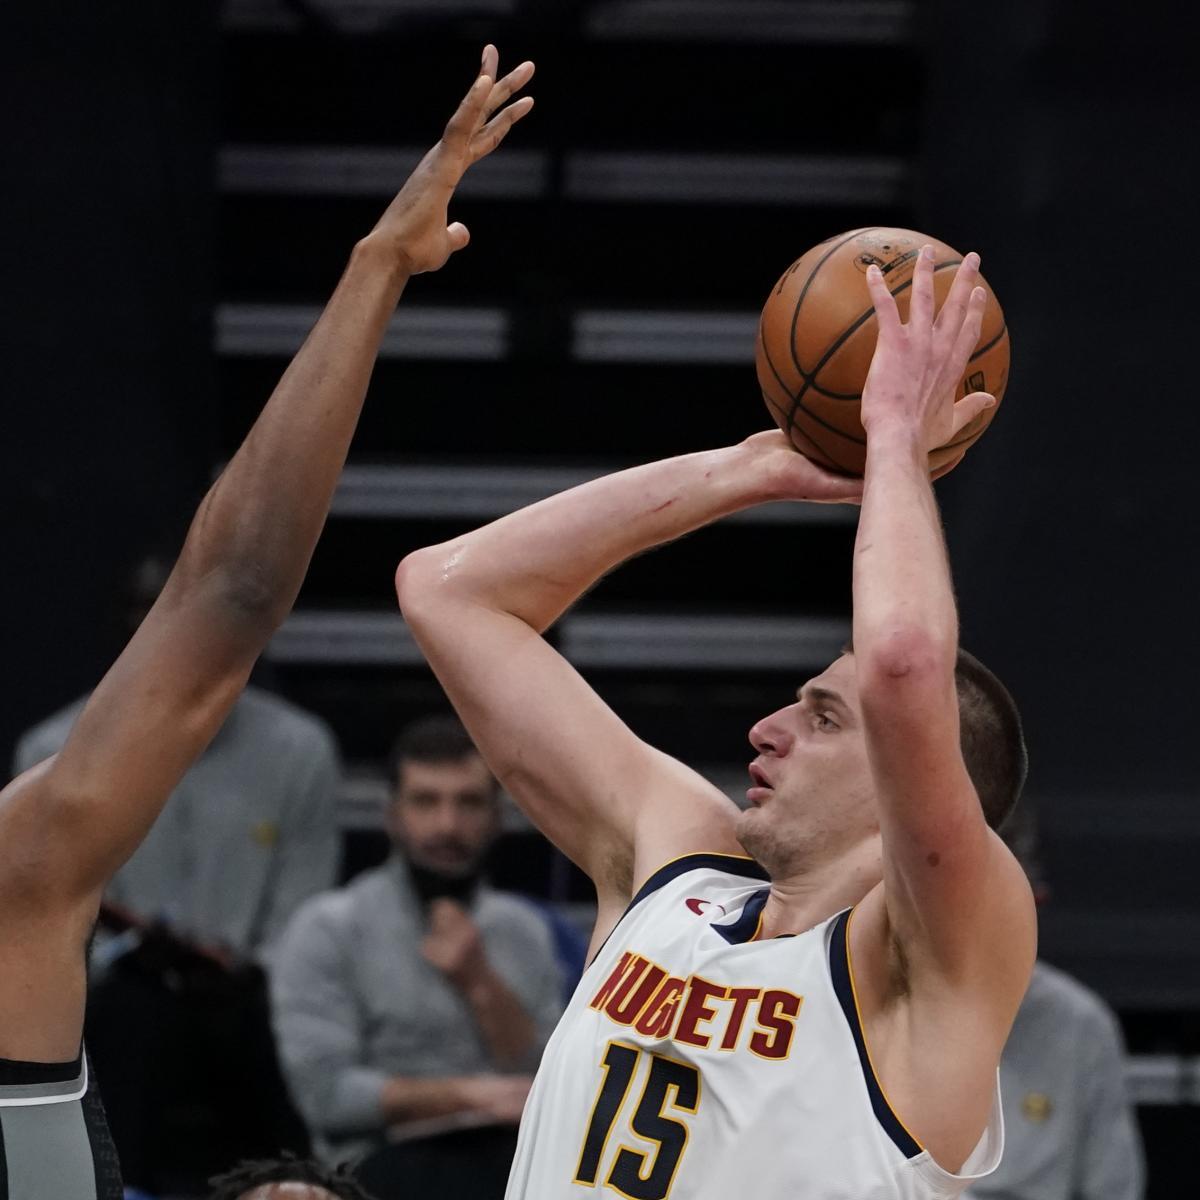 Nikola Jokic Drops Career-High 50 Points as Nuggets Lose to Kings thumbnail